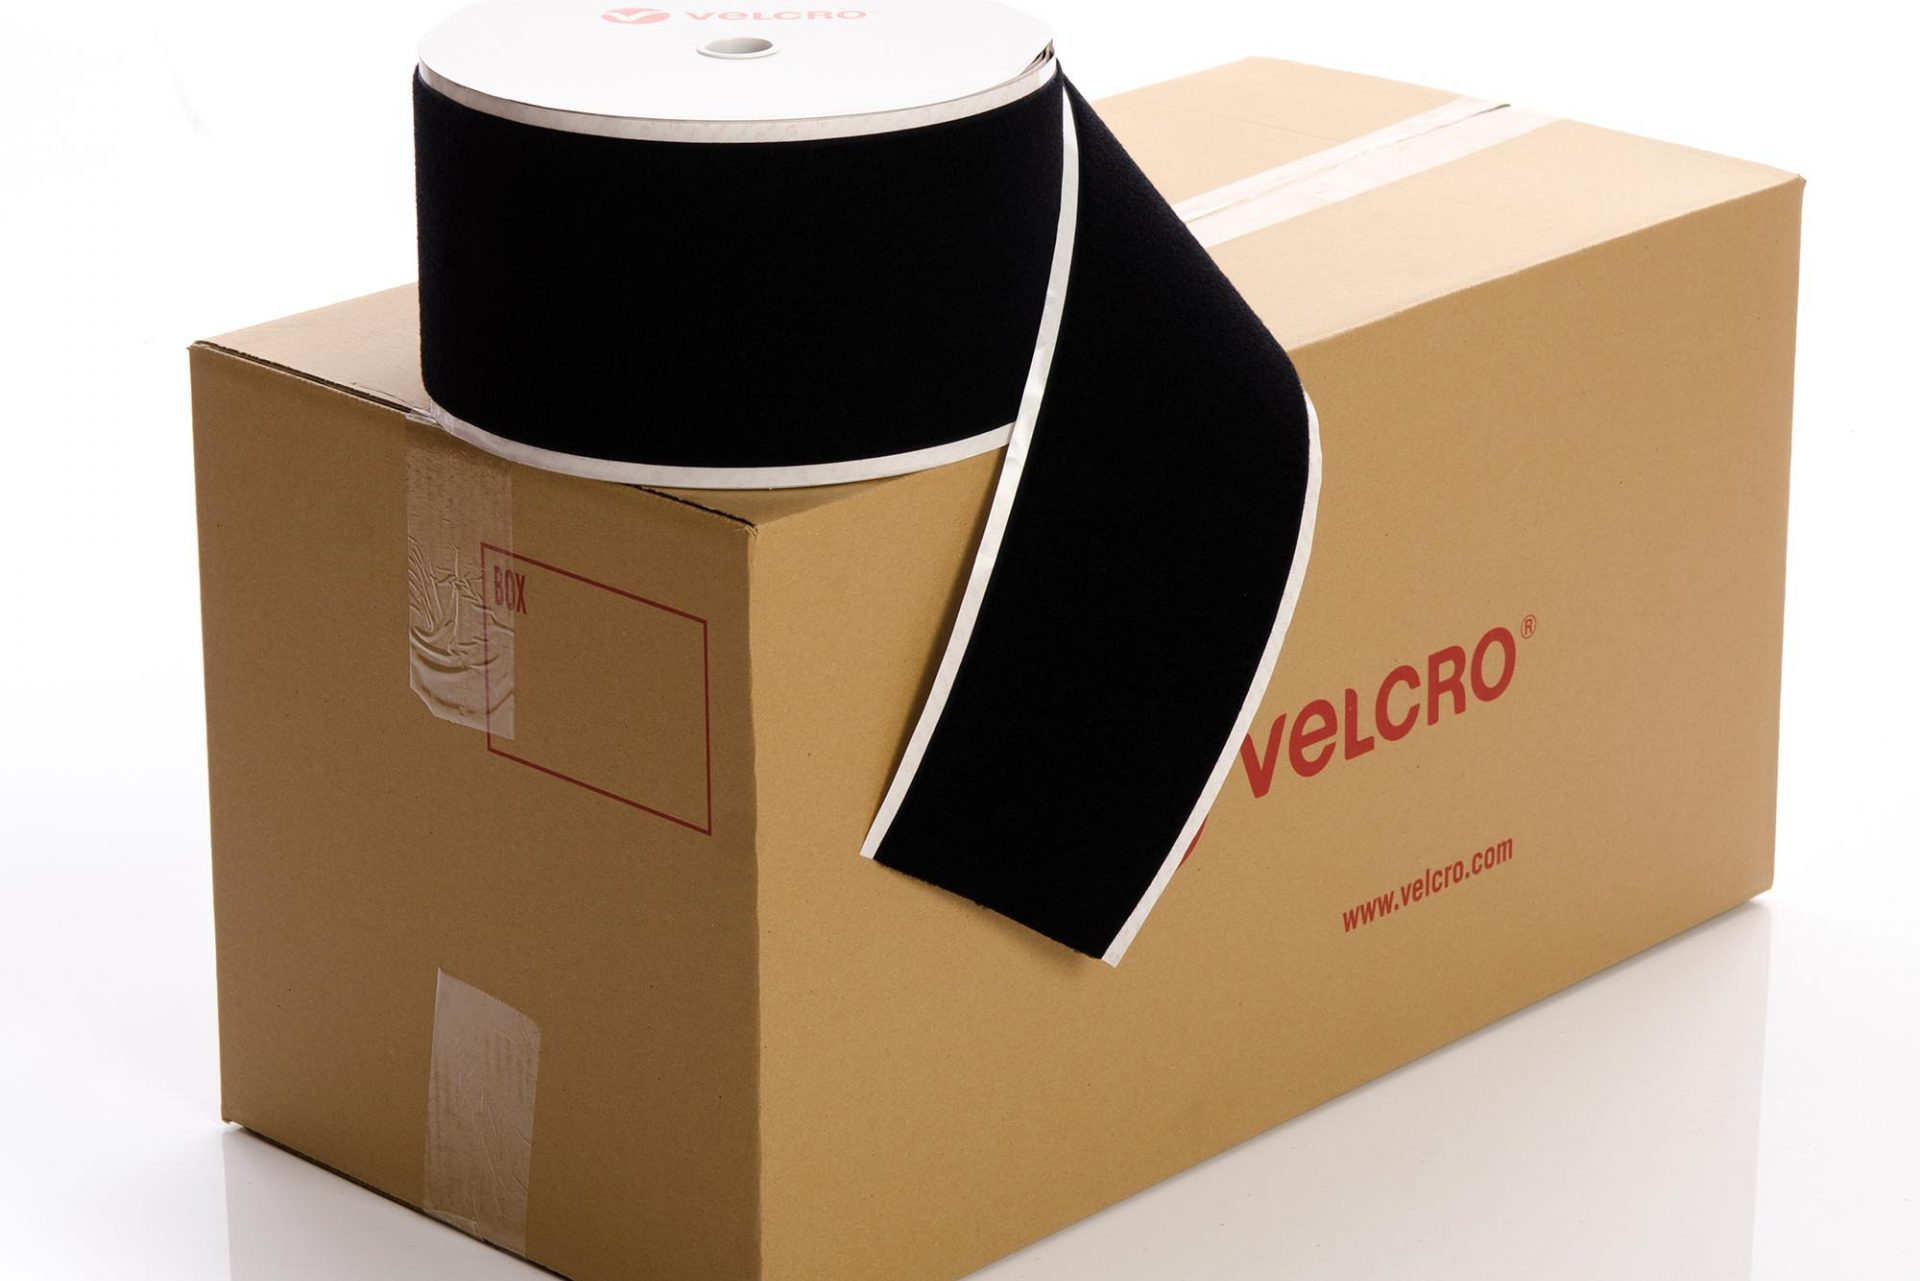 VELCRO® Brand PS14 Stick-on 150mm tape BLACK LOOP case of 6 rolls